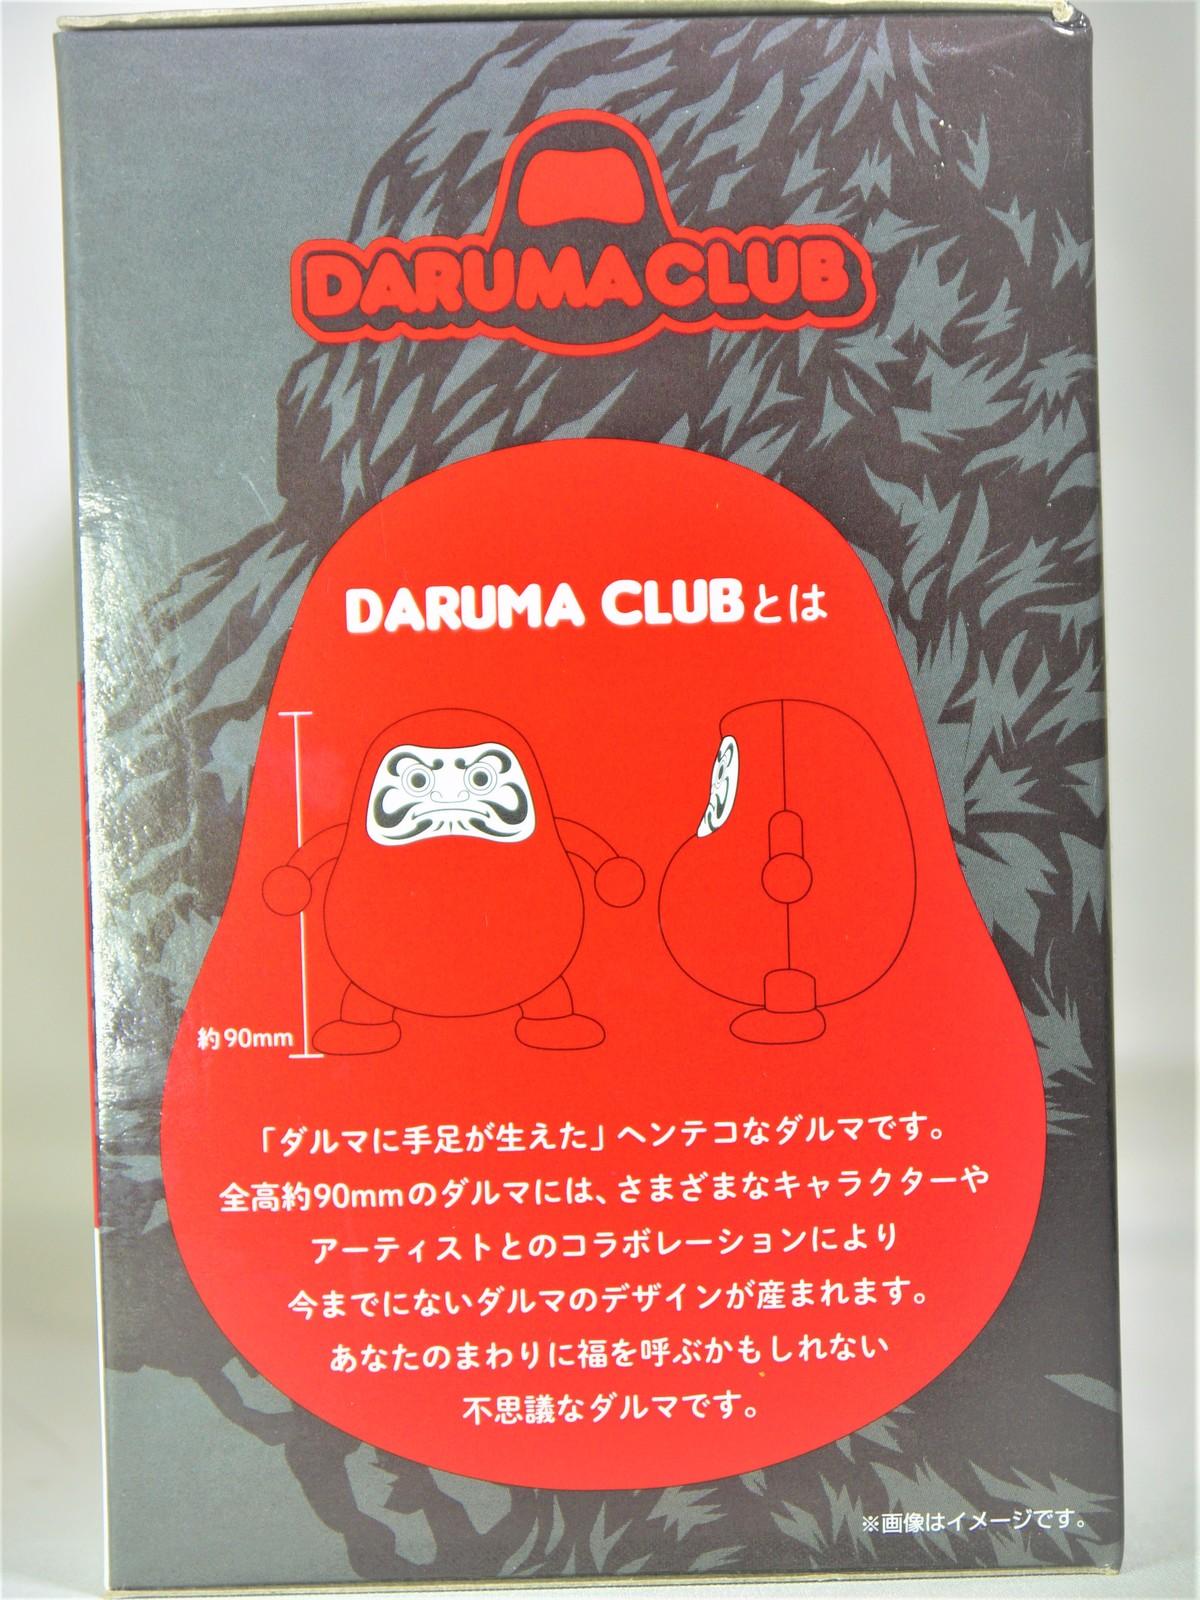 BANDAI DARUMA CLUB GODZILLA GODZILLA 2016 DARUMA FIGURE DARK GREY